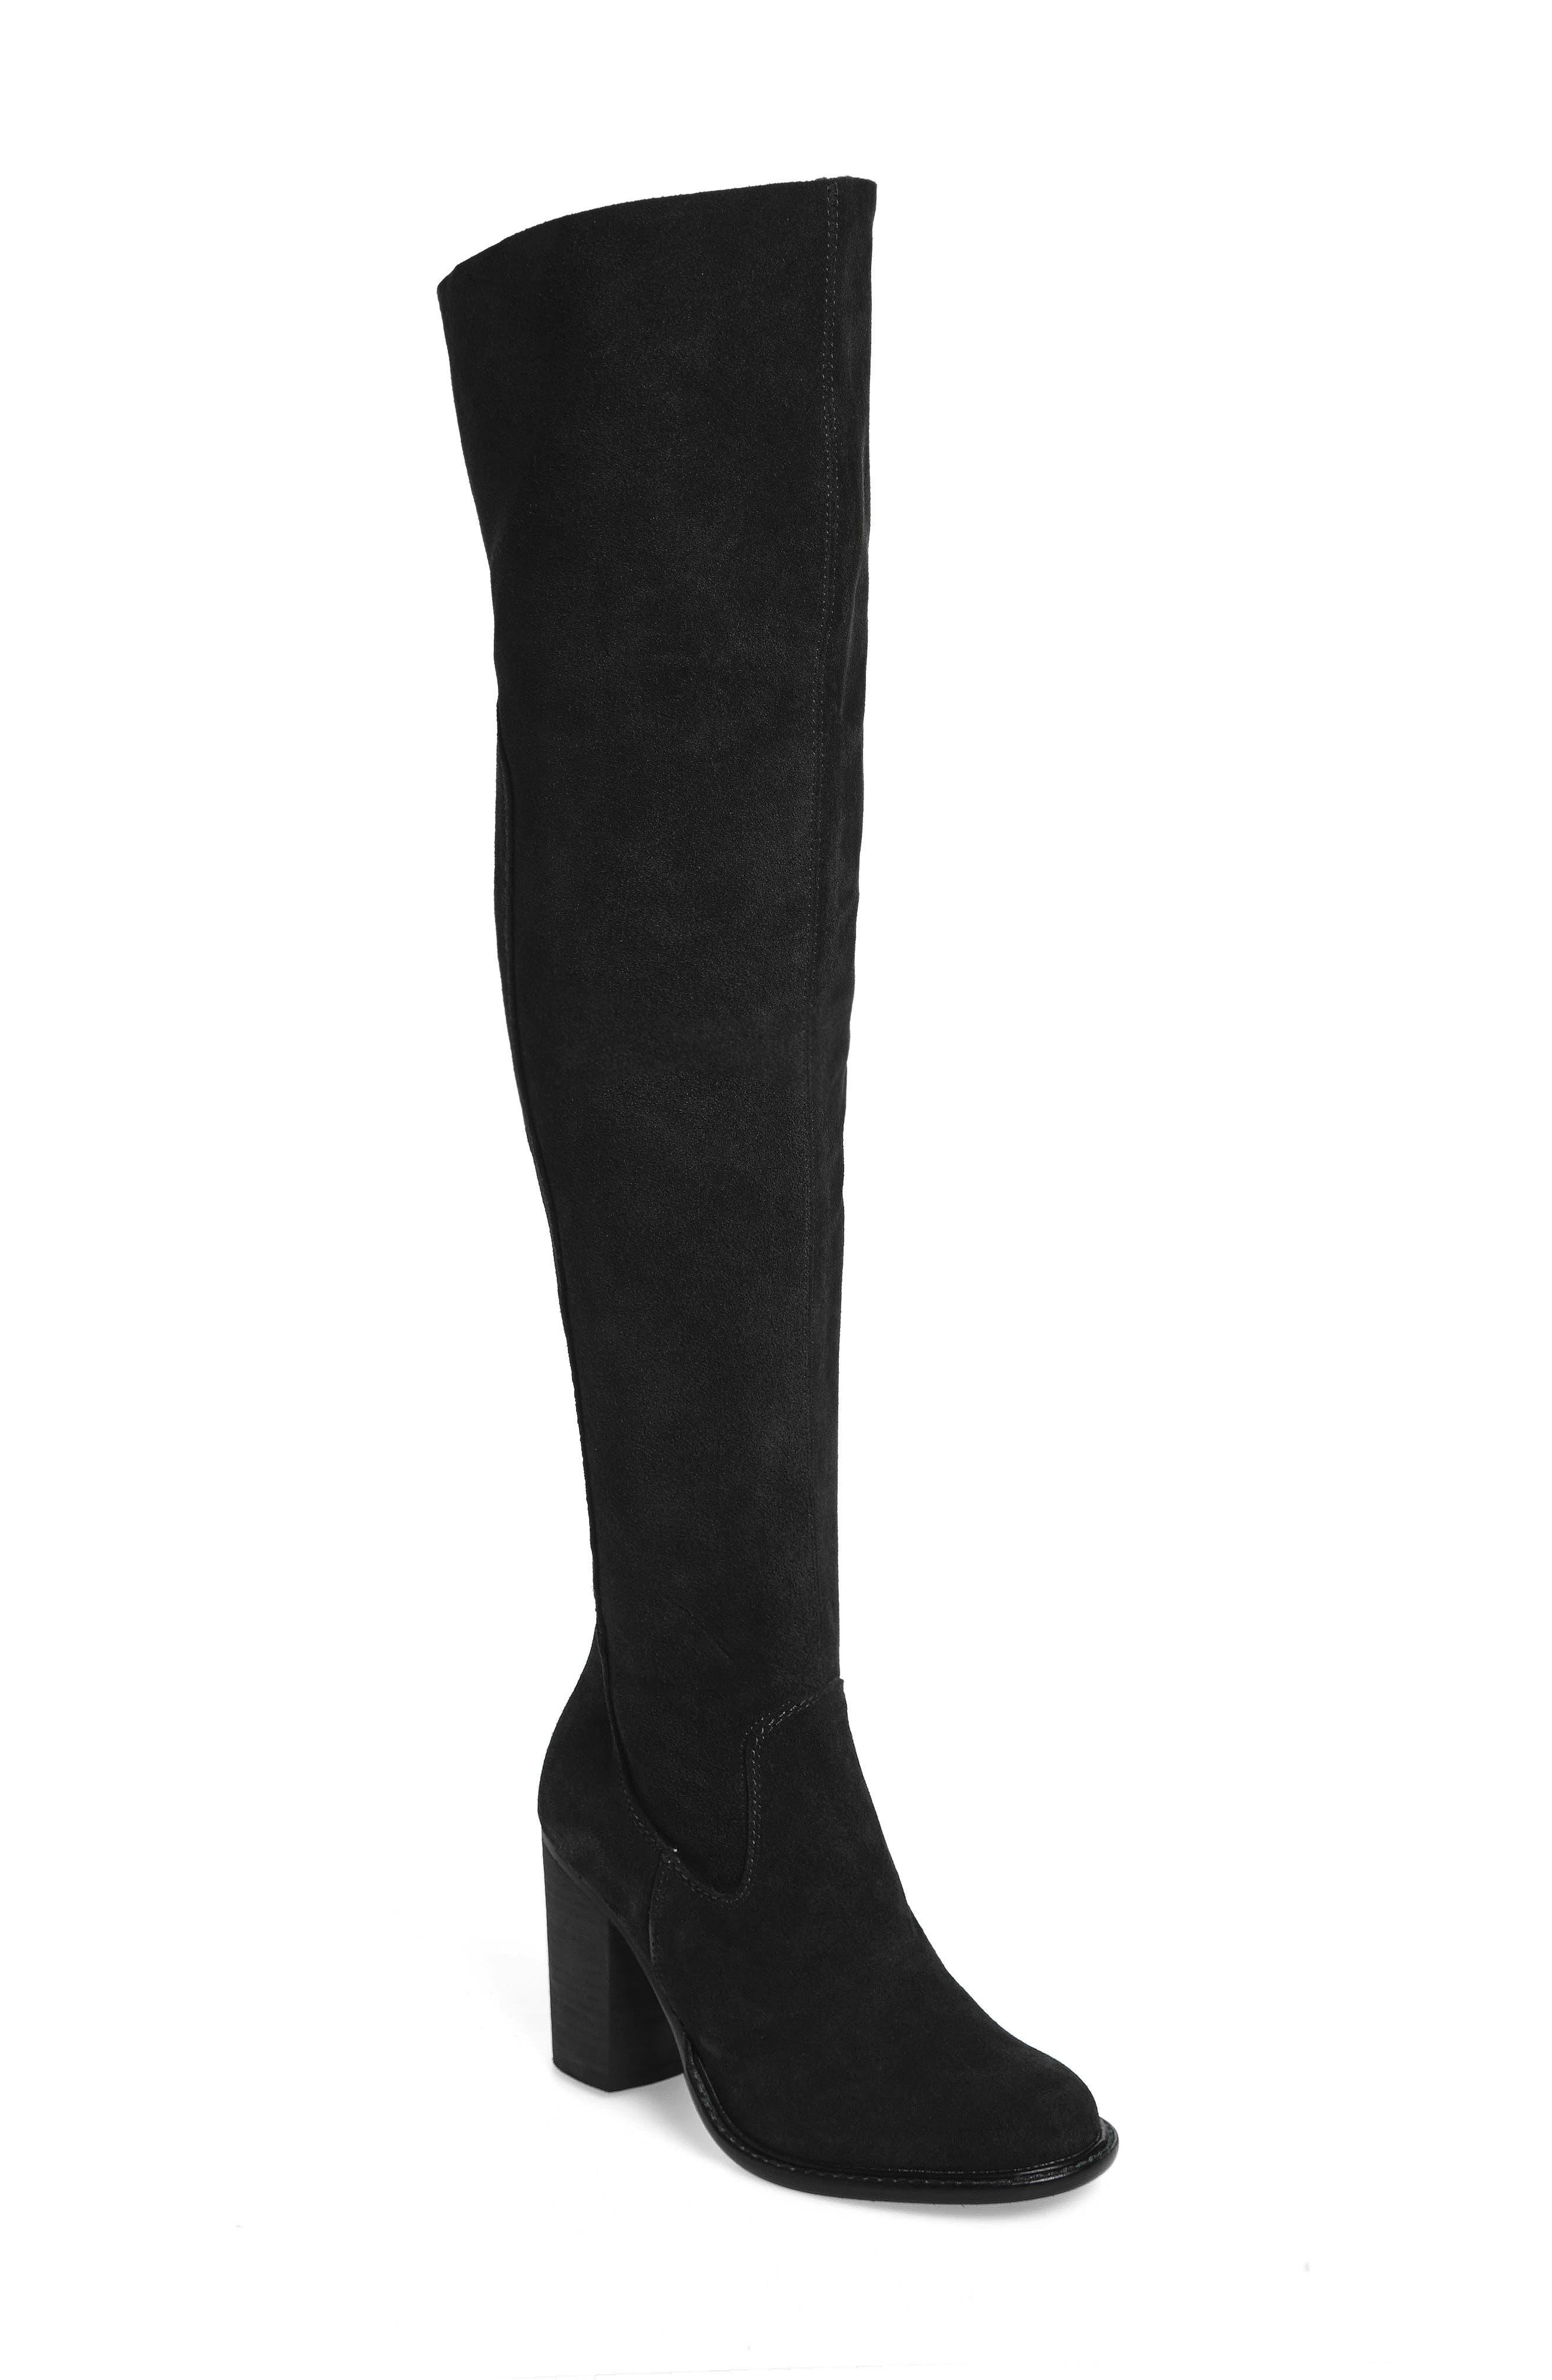 Alternate Image 1 Selected - Kelsi Dagger Brooklyn Logan Over the Knee Boot (Women)